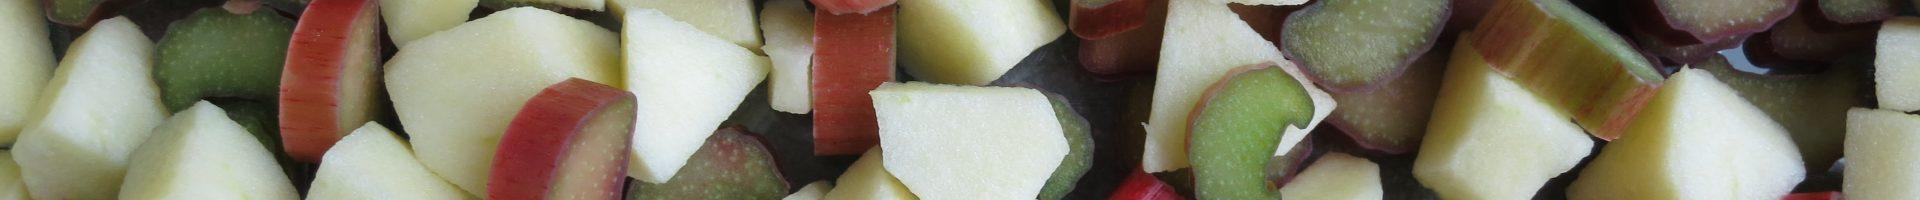 Appel-rabarber crumble